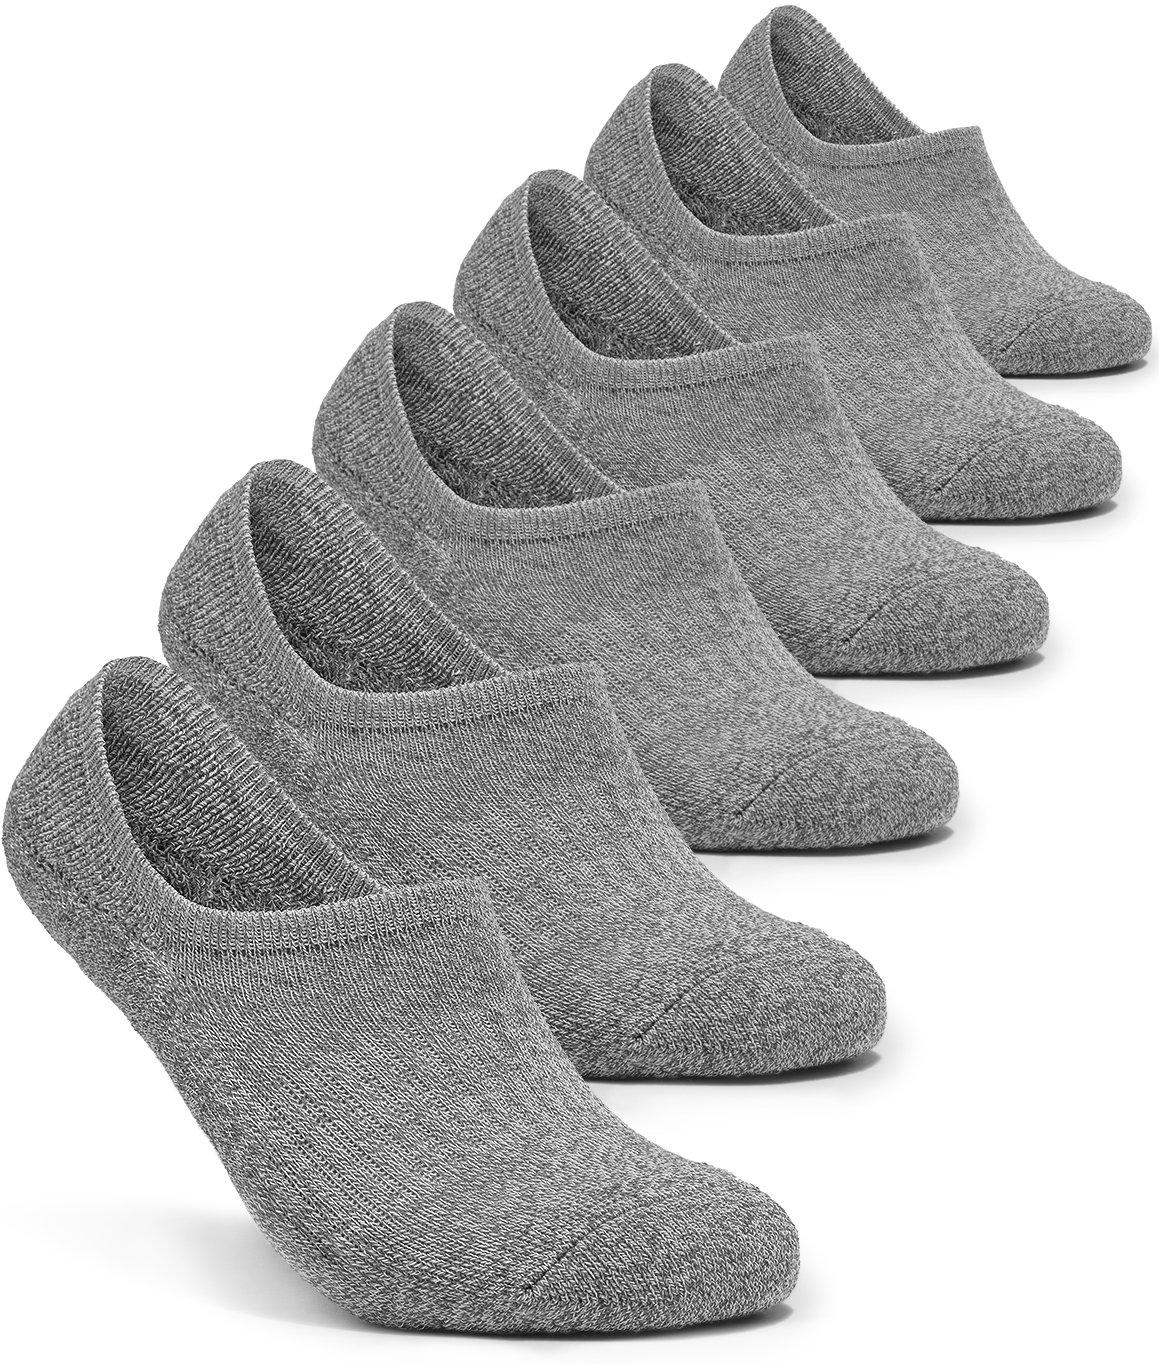 Tesla TM-MZS07-GRY_Medium 6-Pairs Unisex No-Show Casual Fashion Socks w Heel Silicone Grips MZS07